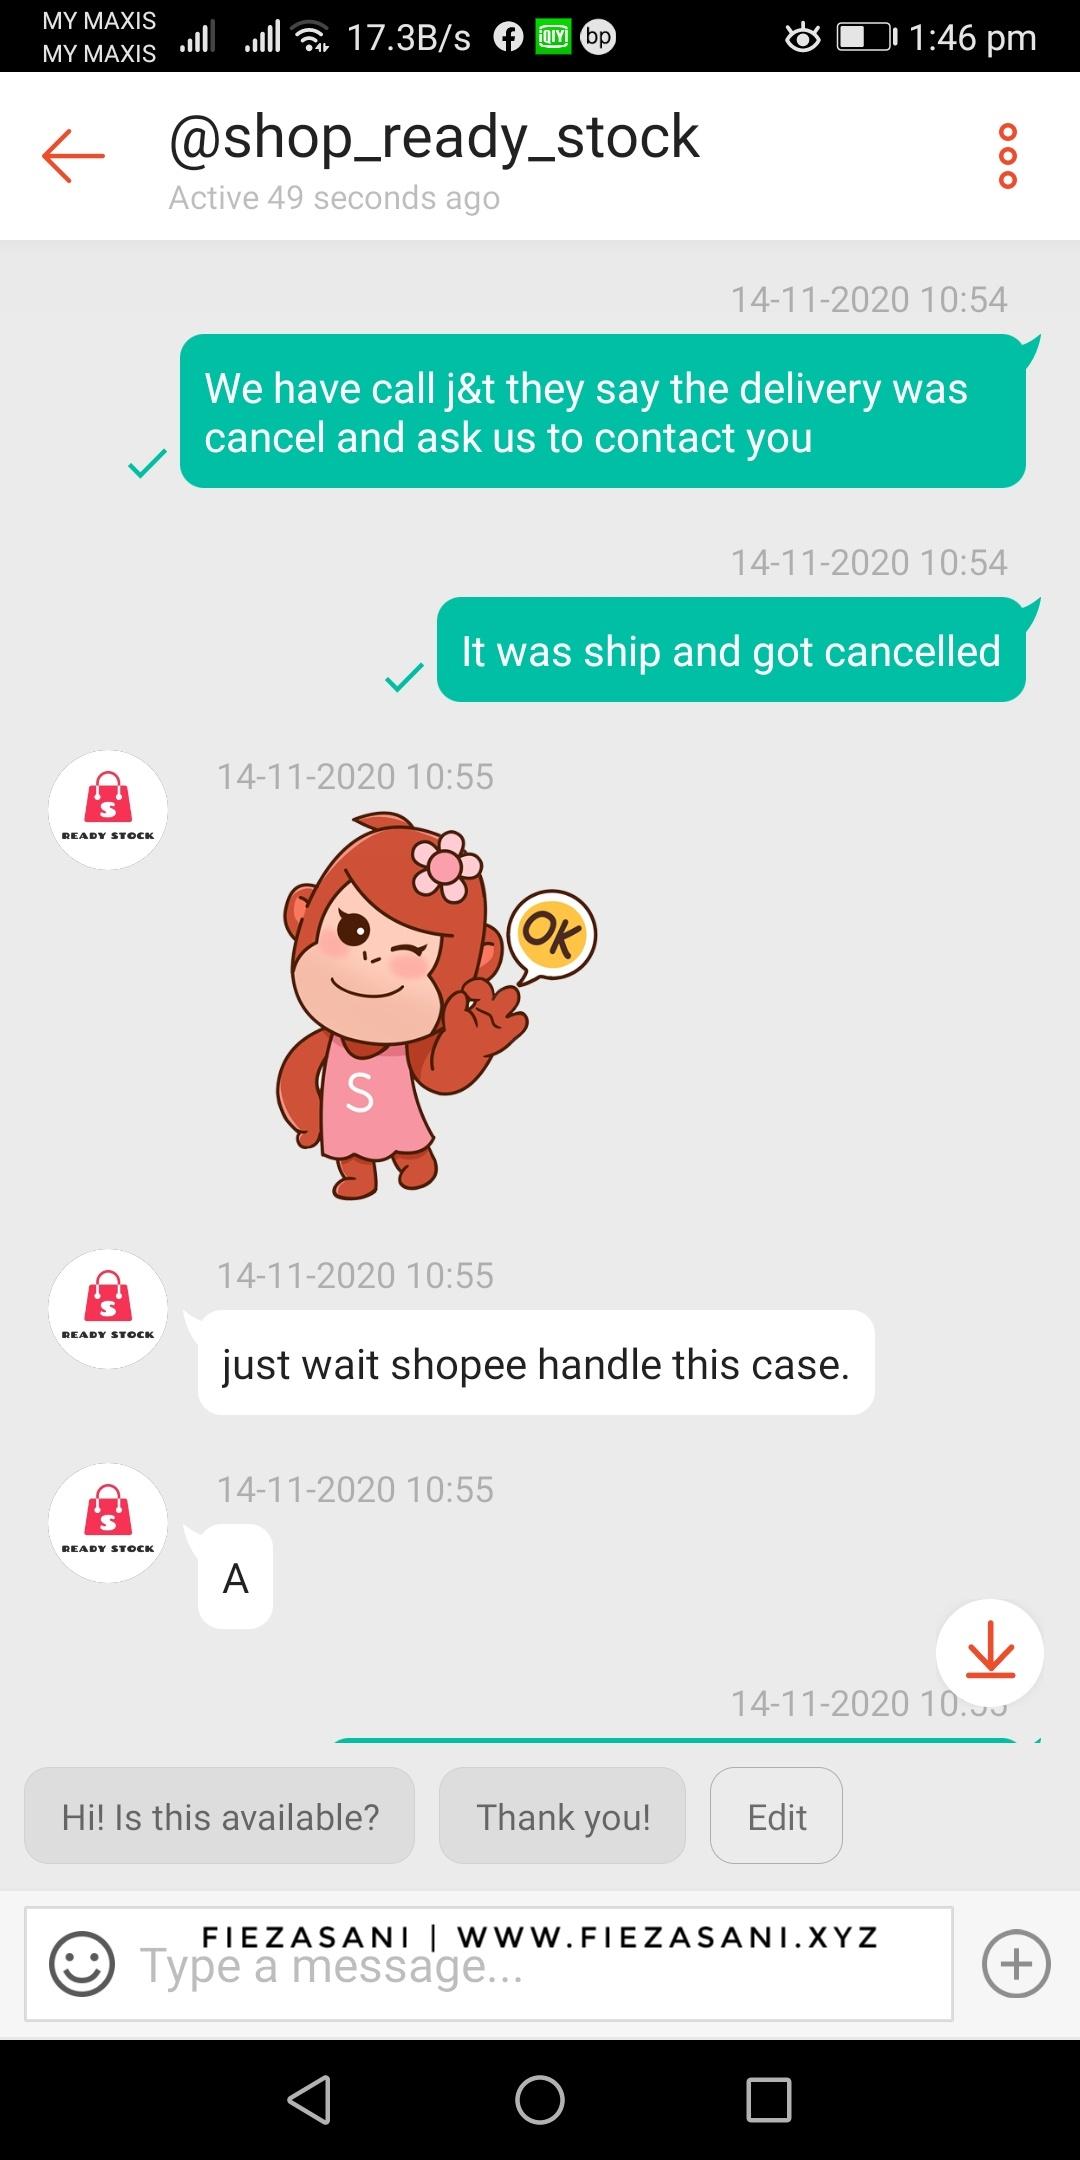 refund dari shopee, tak terima barang shopee, dispute refund